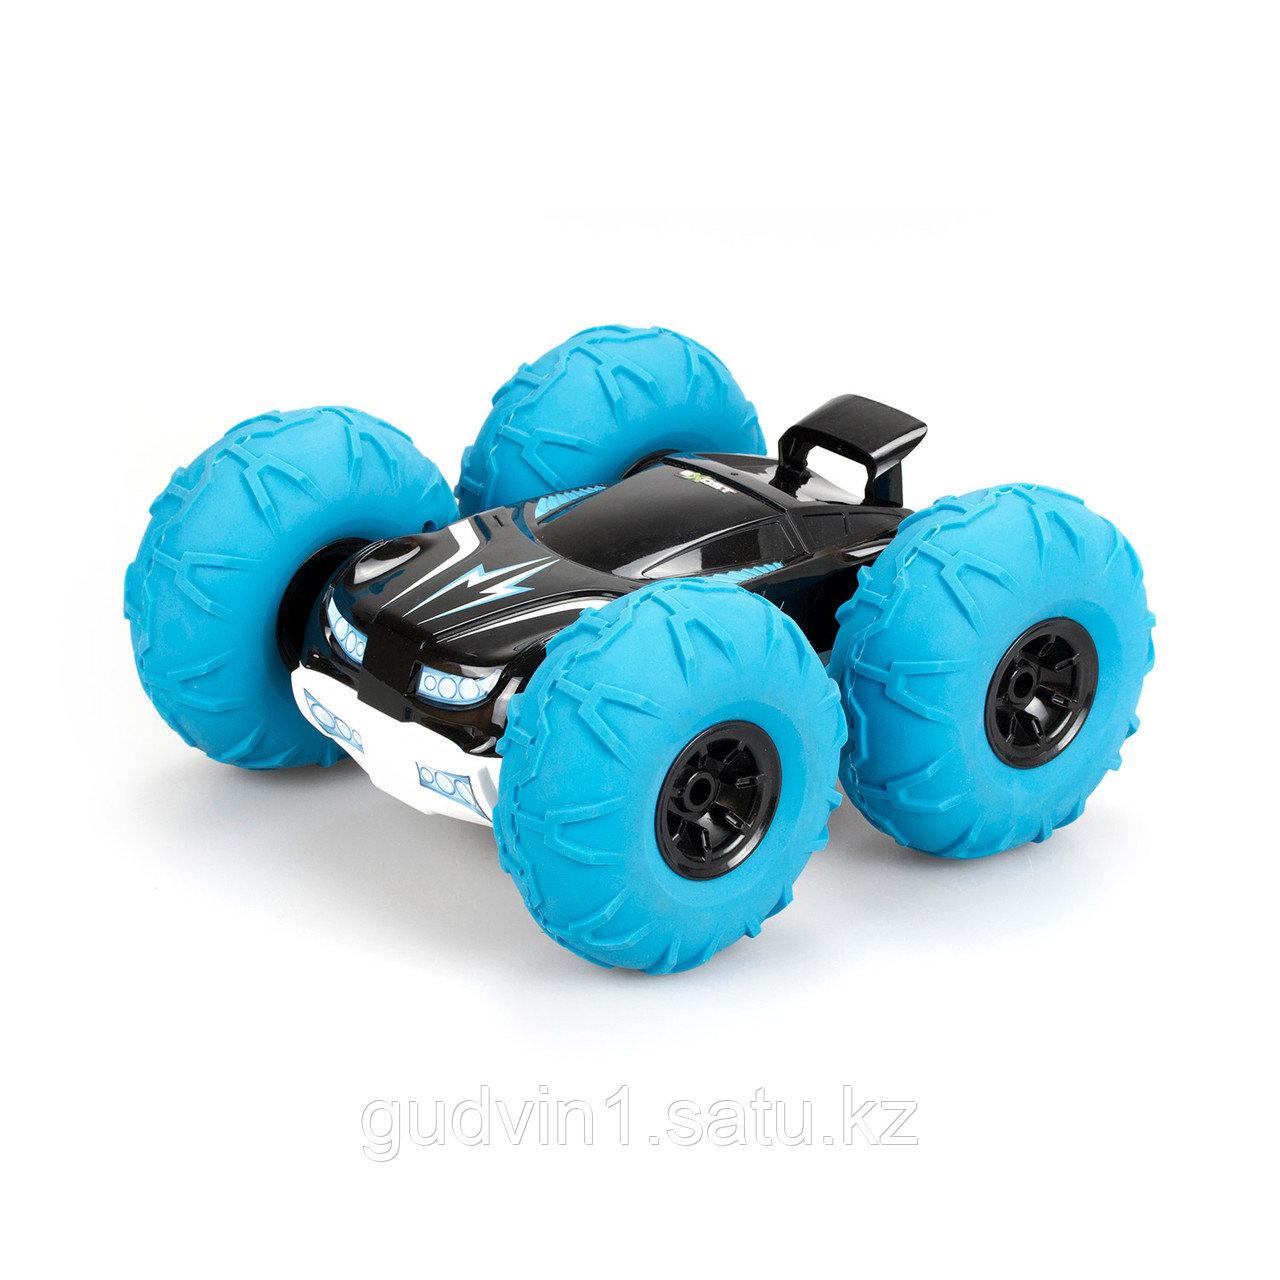 Машина 360 Торнадо синяя 20142-1